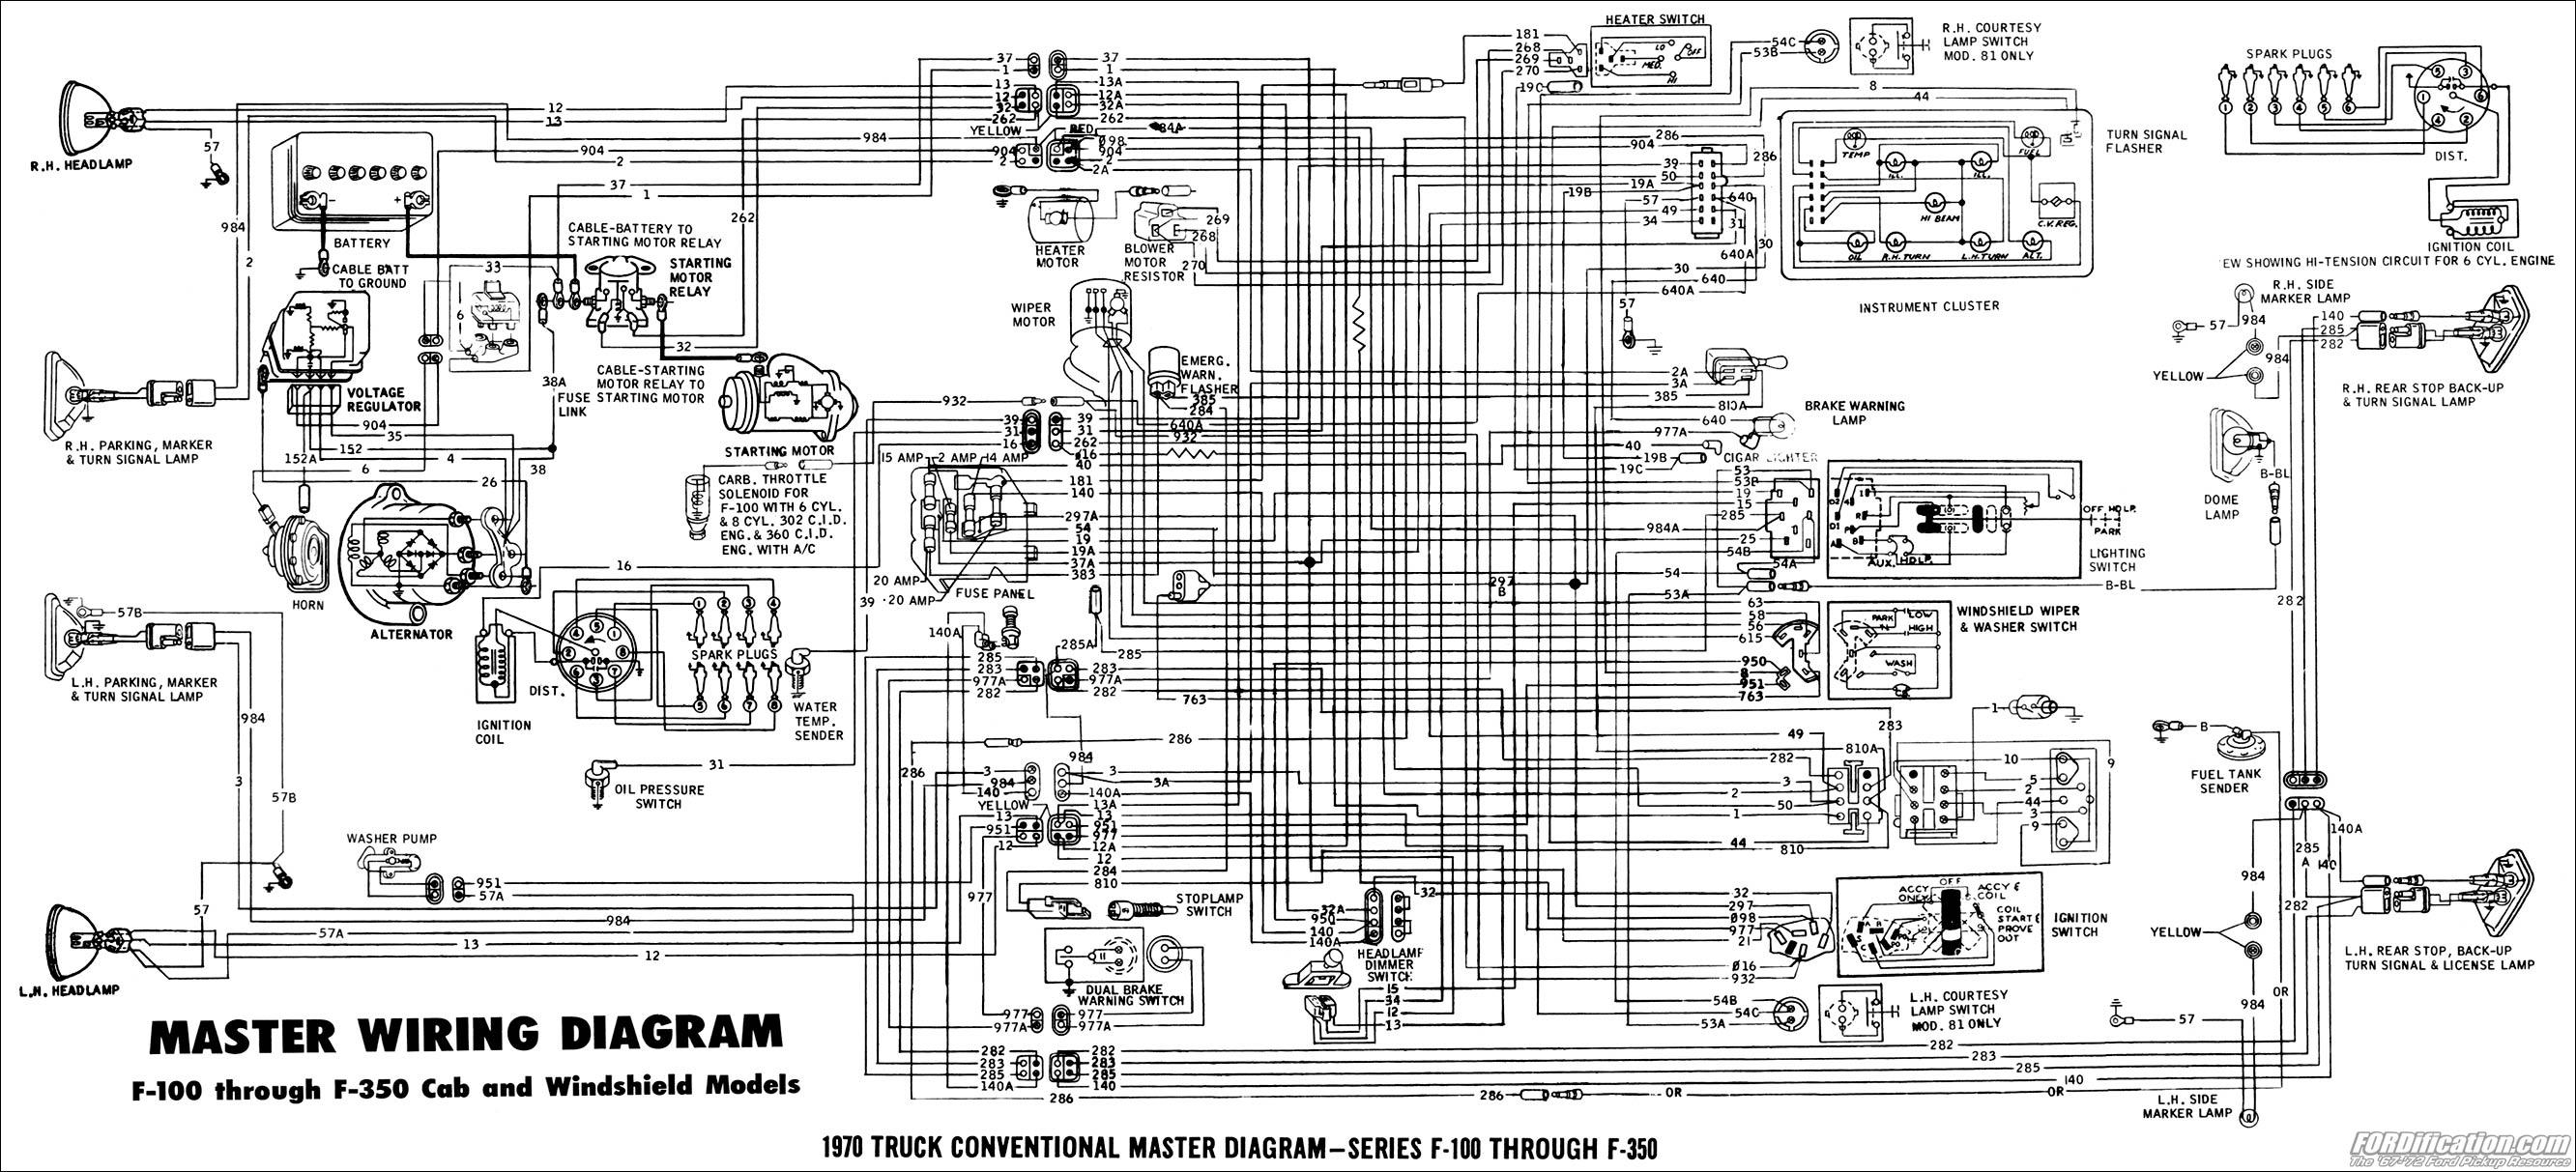 Nissan Start Wiring Diagram – Jeep Grand Cherokee Remote Start Wiring Diagram